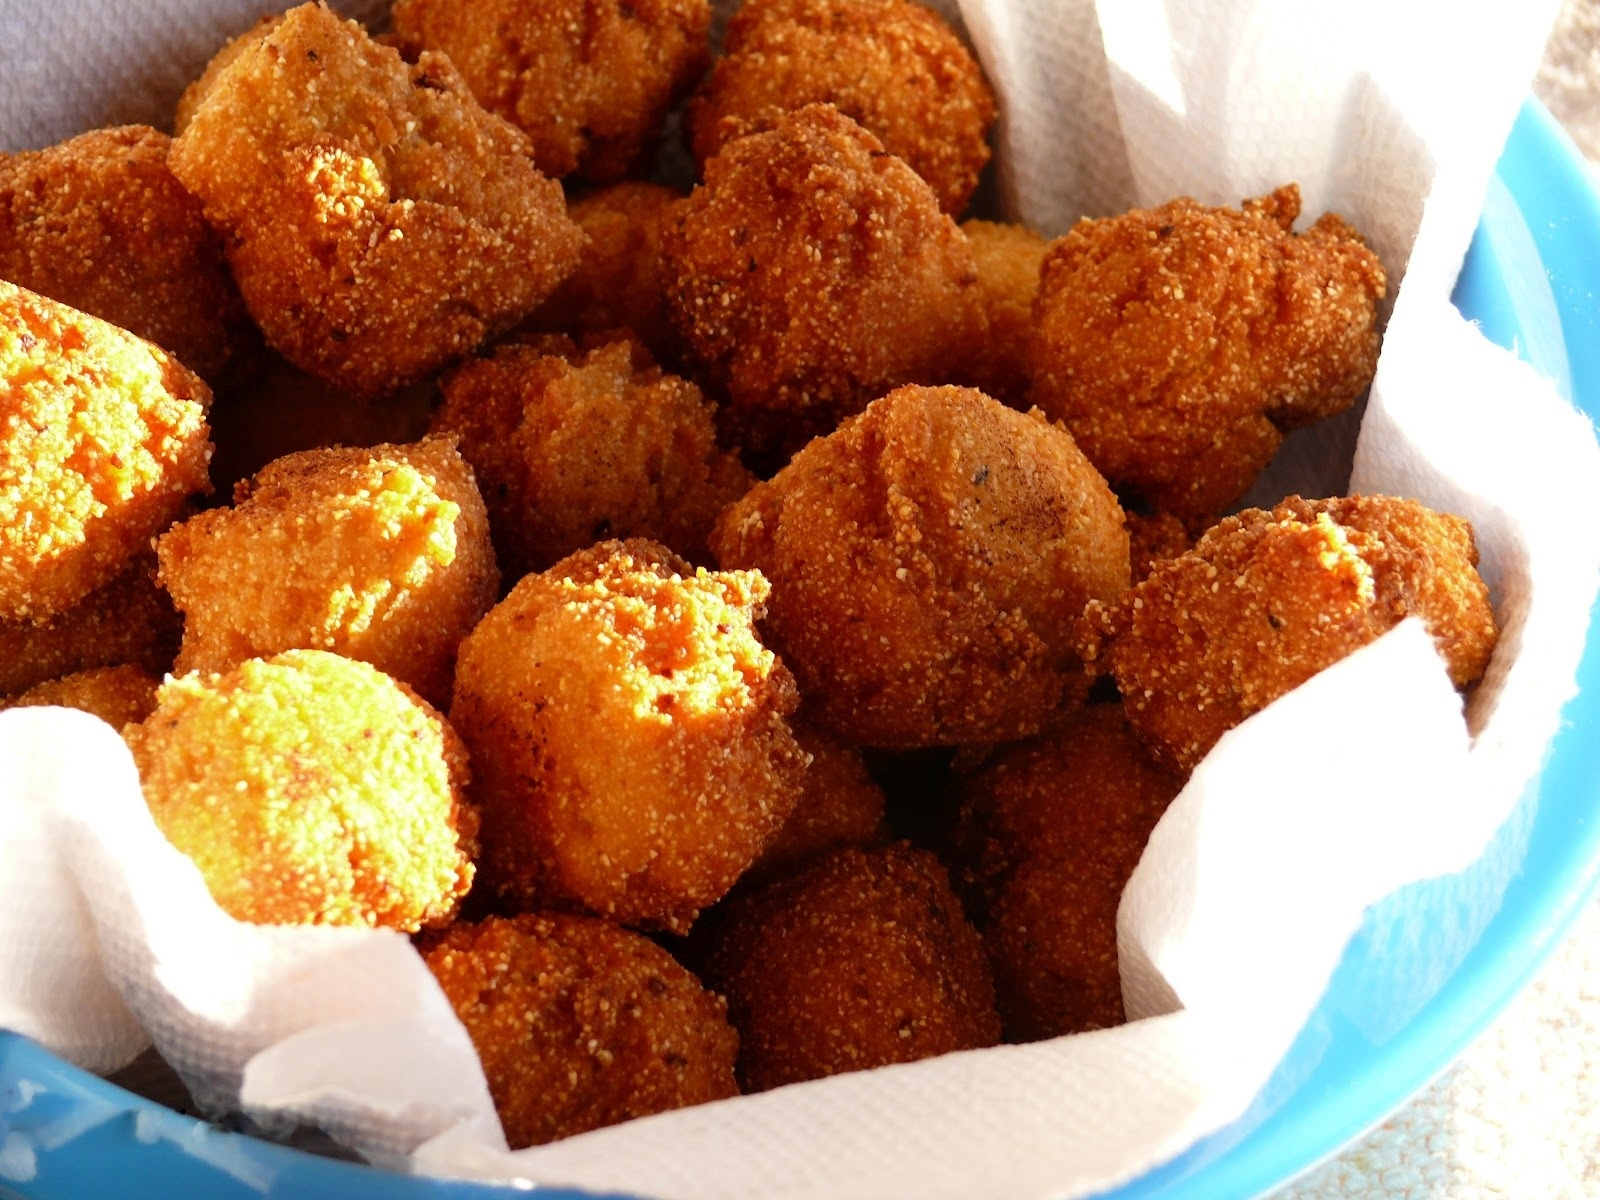 Foodie friday shrimp gumbo with bonus recipe for hush for Carolina fish fry